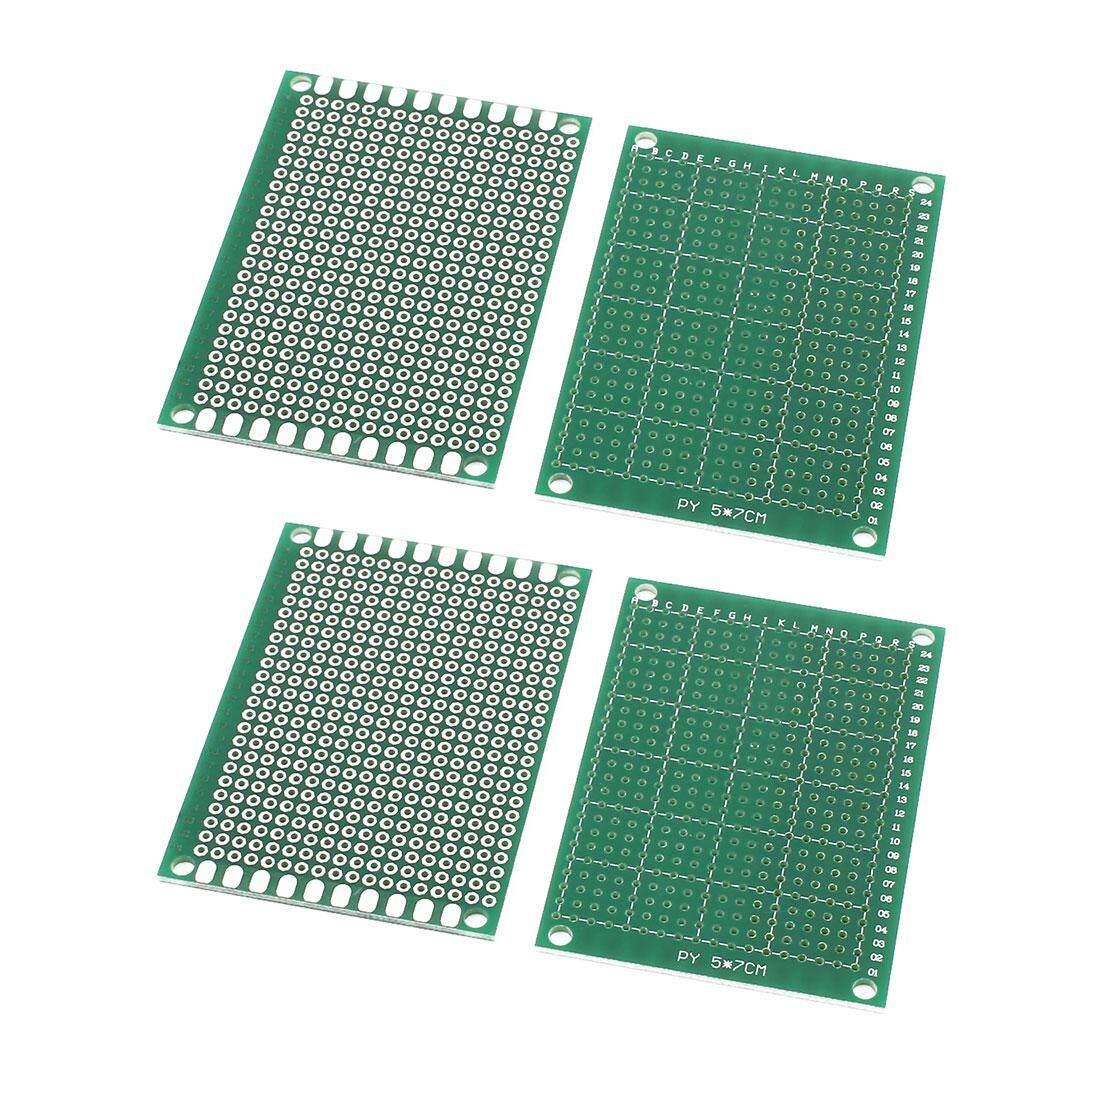 10xdiy Single Side Copper Pcb Universal Experiment Matrix Circuit Soldering Prototype Printed Board 70x90mm 2 Ebay 7cm X 3cm 5pcsmyr44 Myr 45